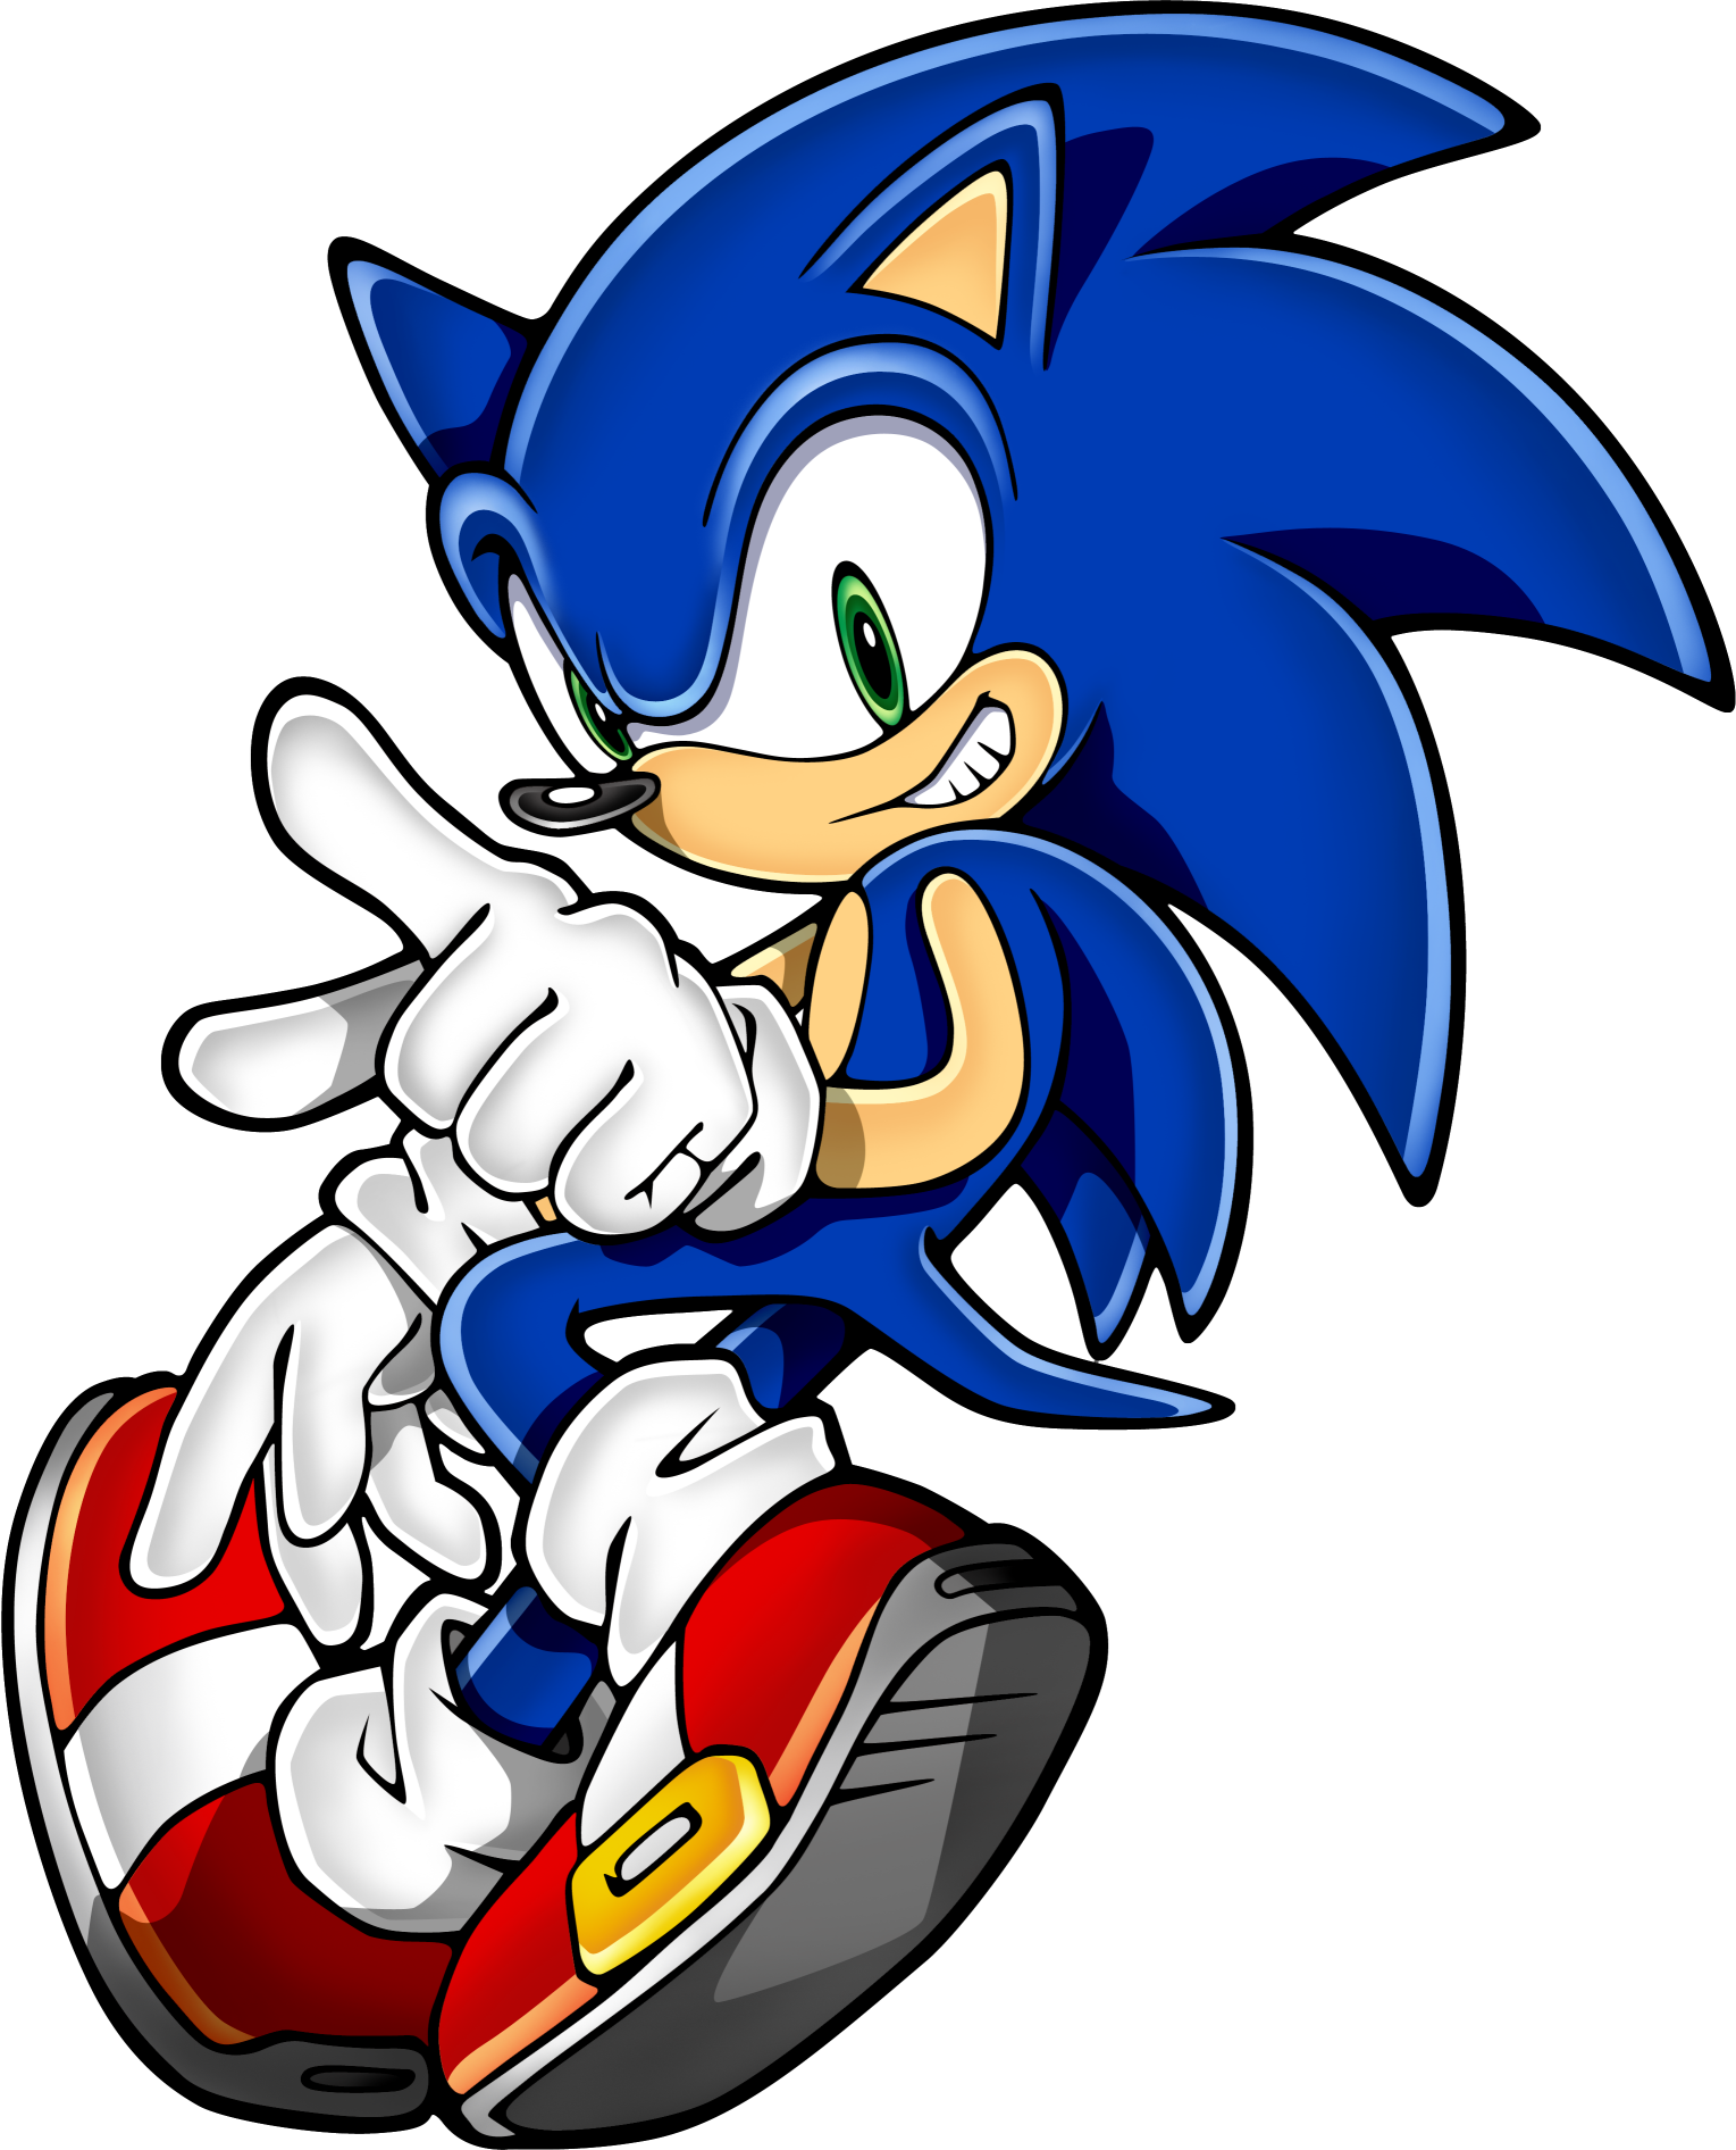 Gambar Kartun Sonic Knuckles: Image - Sonic 126.png